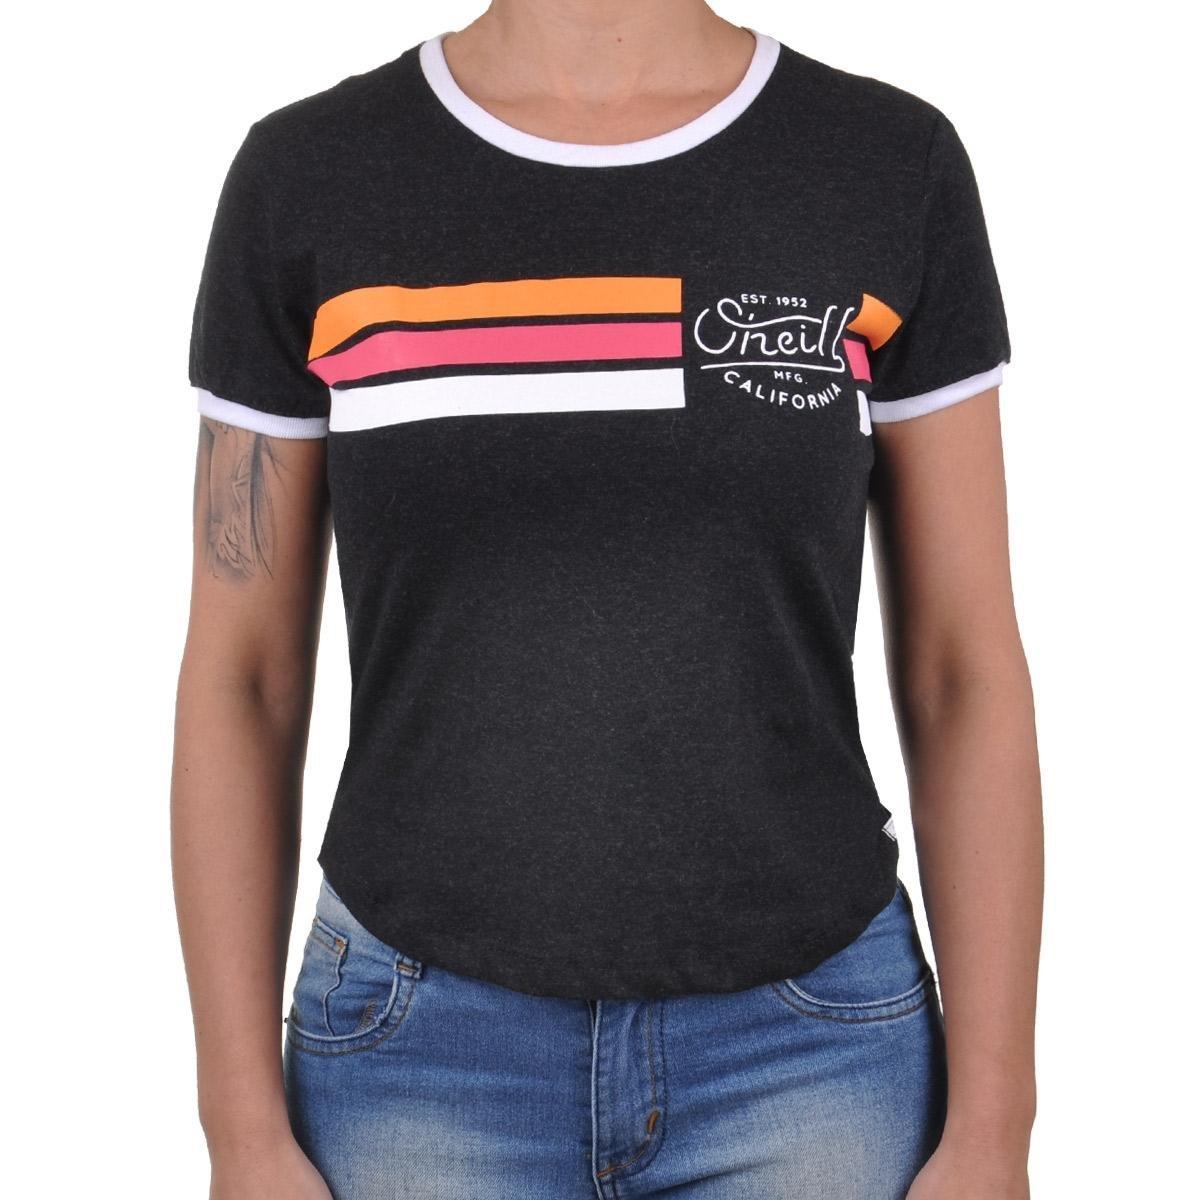 Camiseta Gooddays Oneill Camiseta Oneill Preto Feminino Gooddays EvqUSwF